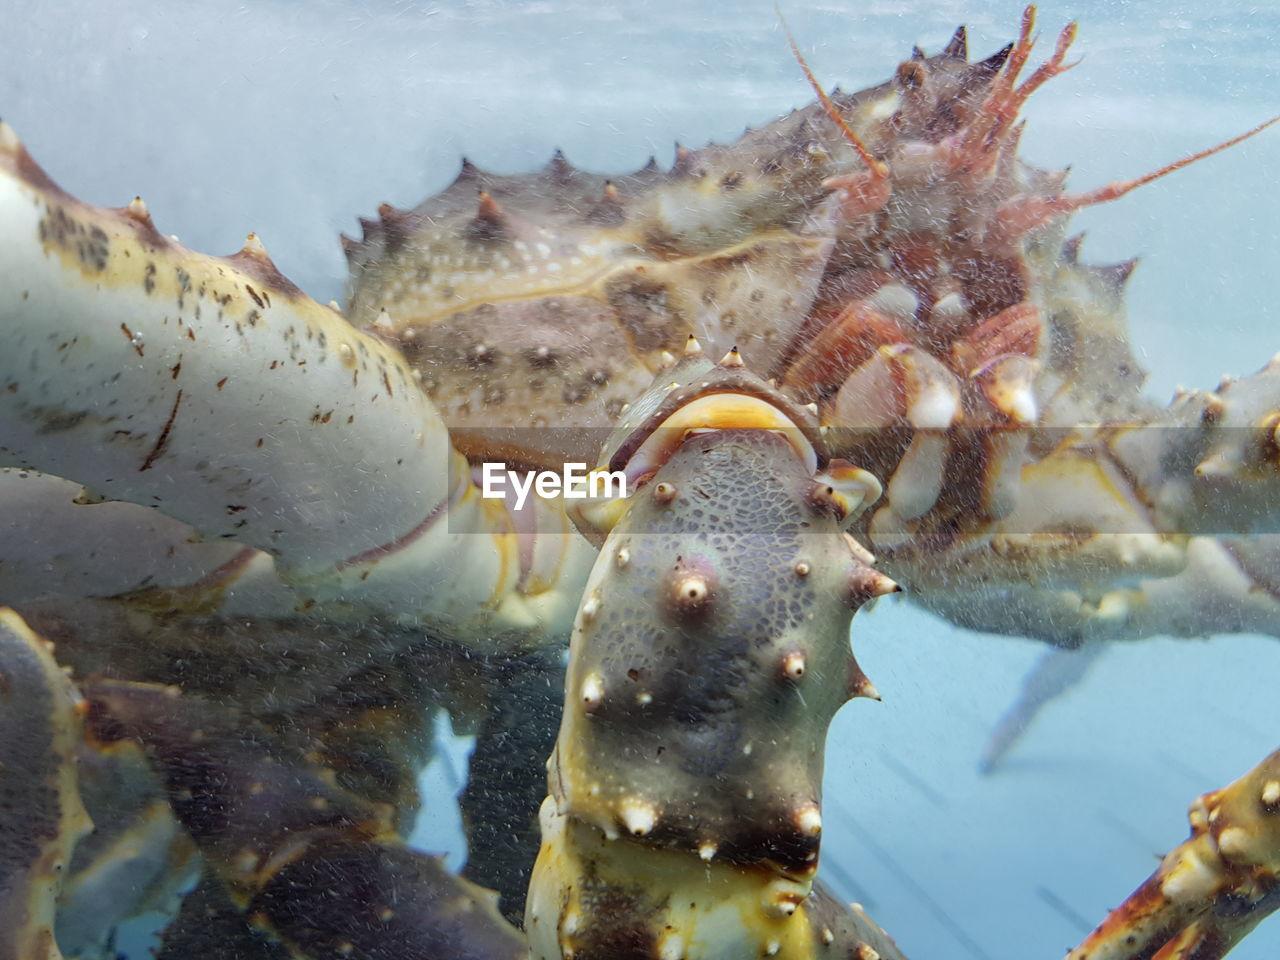 sea, animals in the wild, animal wildlife, animal themes, water, animal, underwater, sea life, marine, one animal, close-up, no people, nature, undersea, crustacean, fish, swimming, crab, outdoors